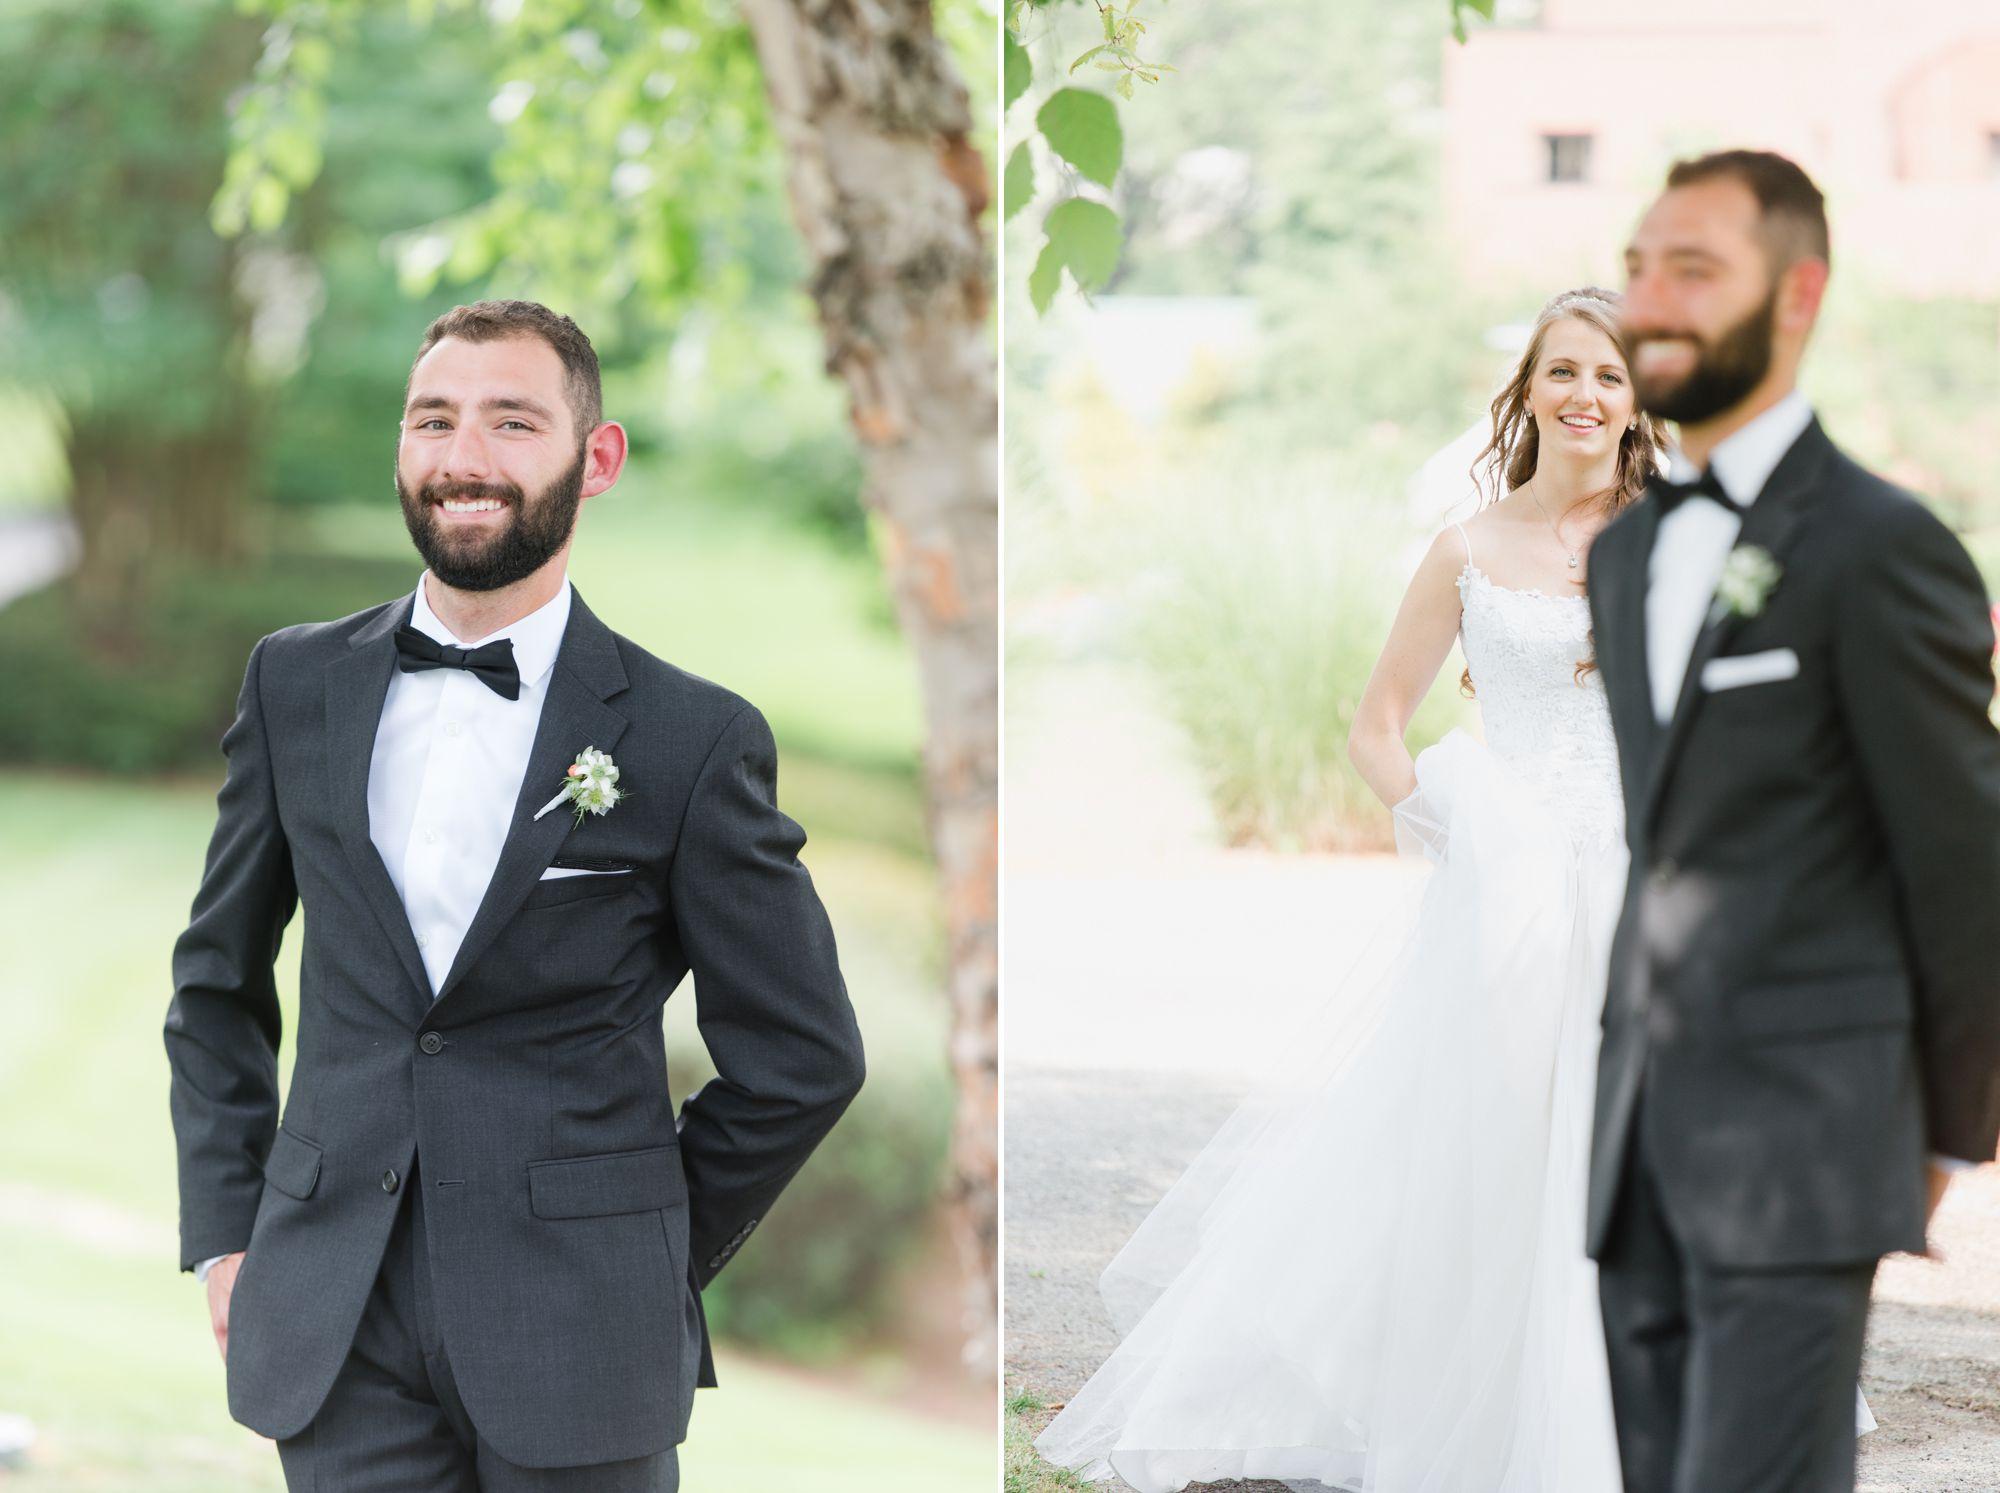 uptown-charlotte-orthodox-greek-wedding 28